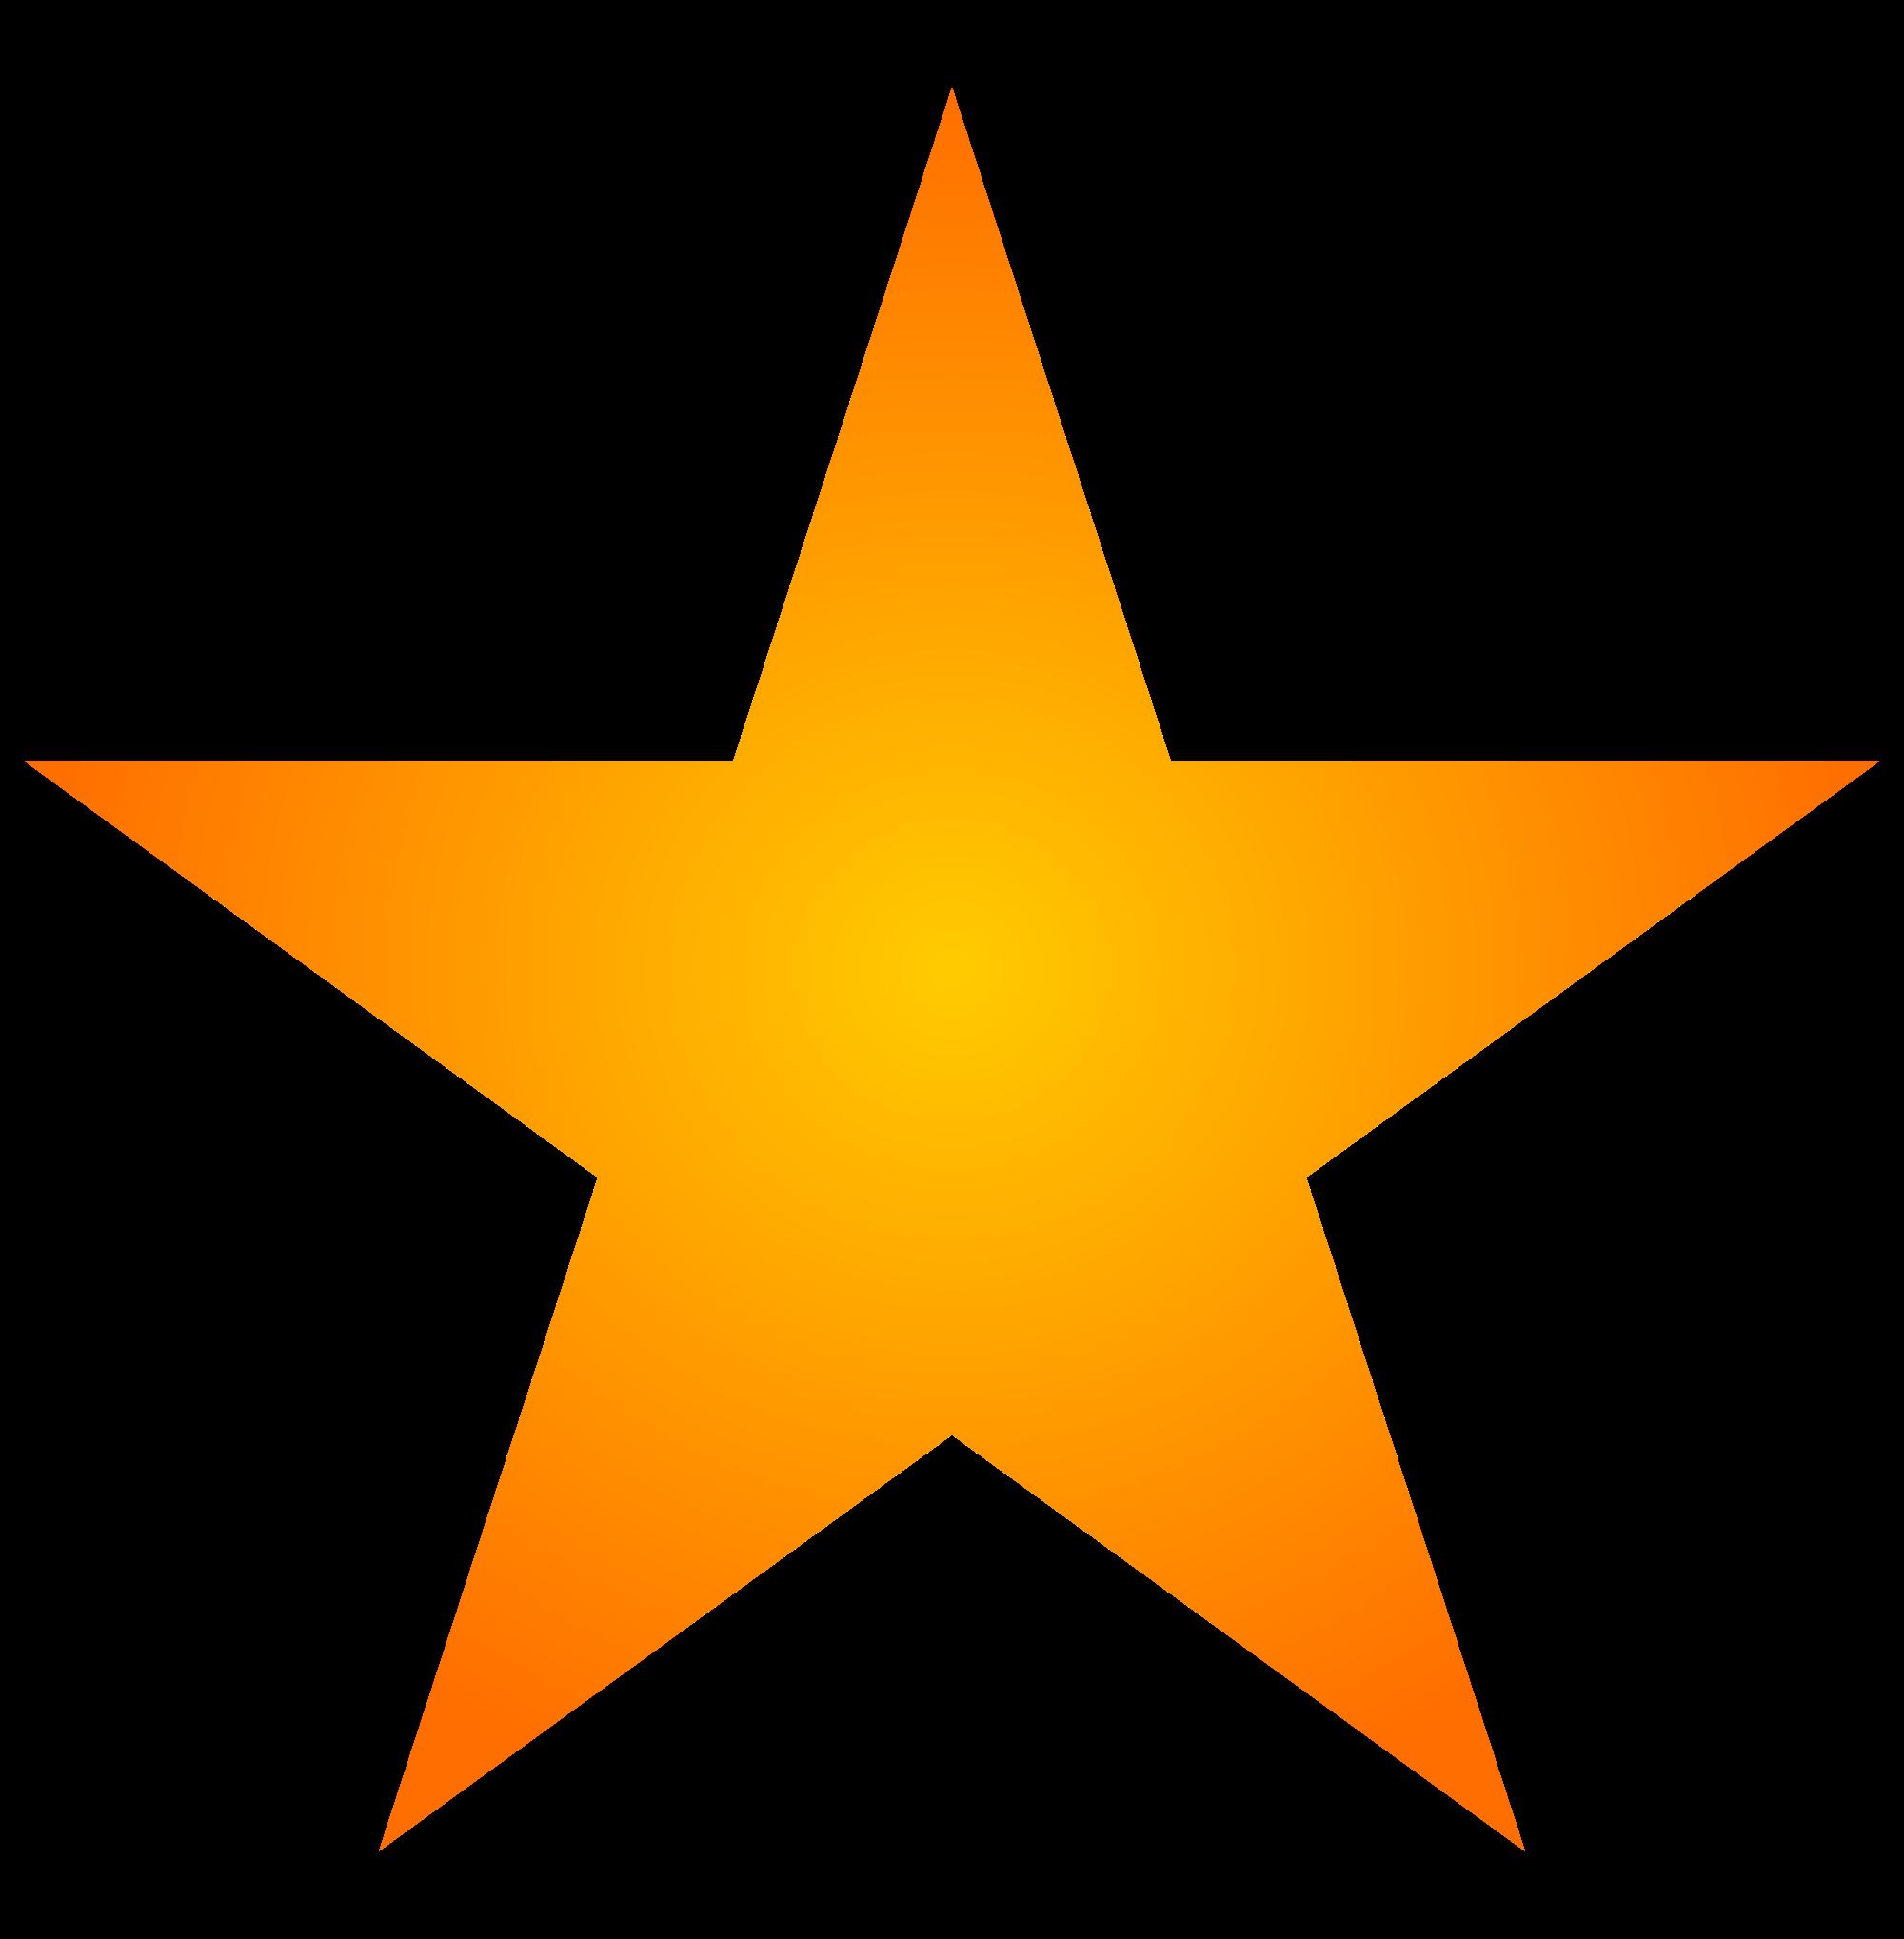 Star cut out clipart clip freeuse download inspiration star cut out | Ceramics idea's | Pinterest | Star, Clip ... clip freeuse download